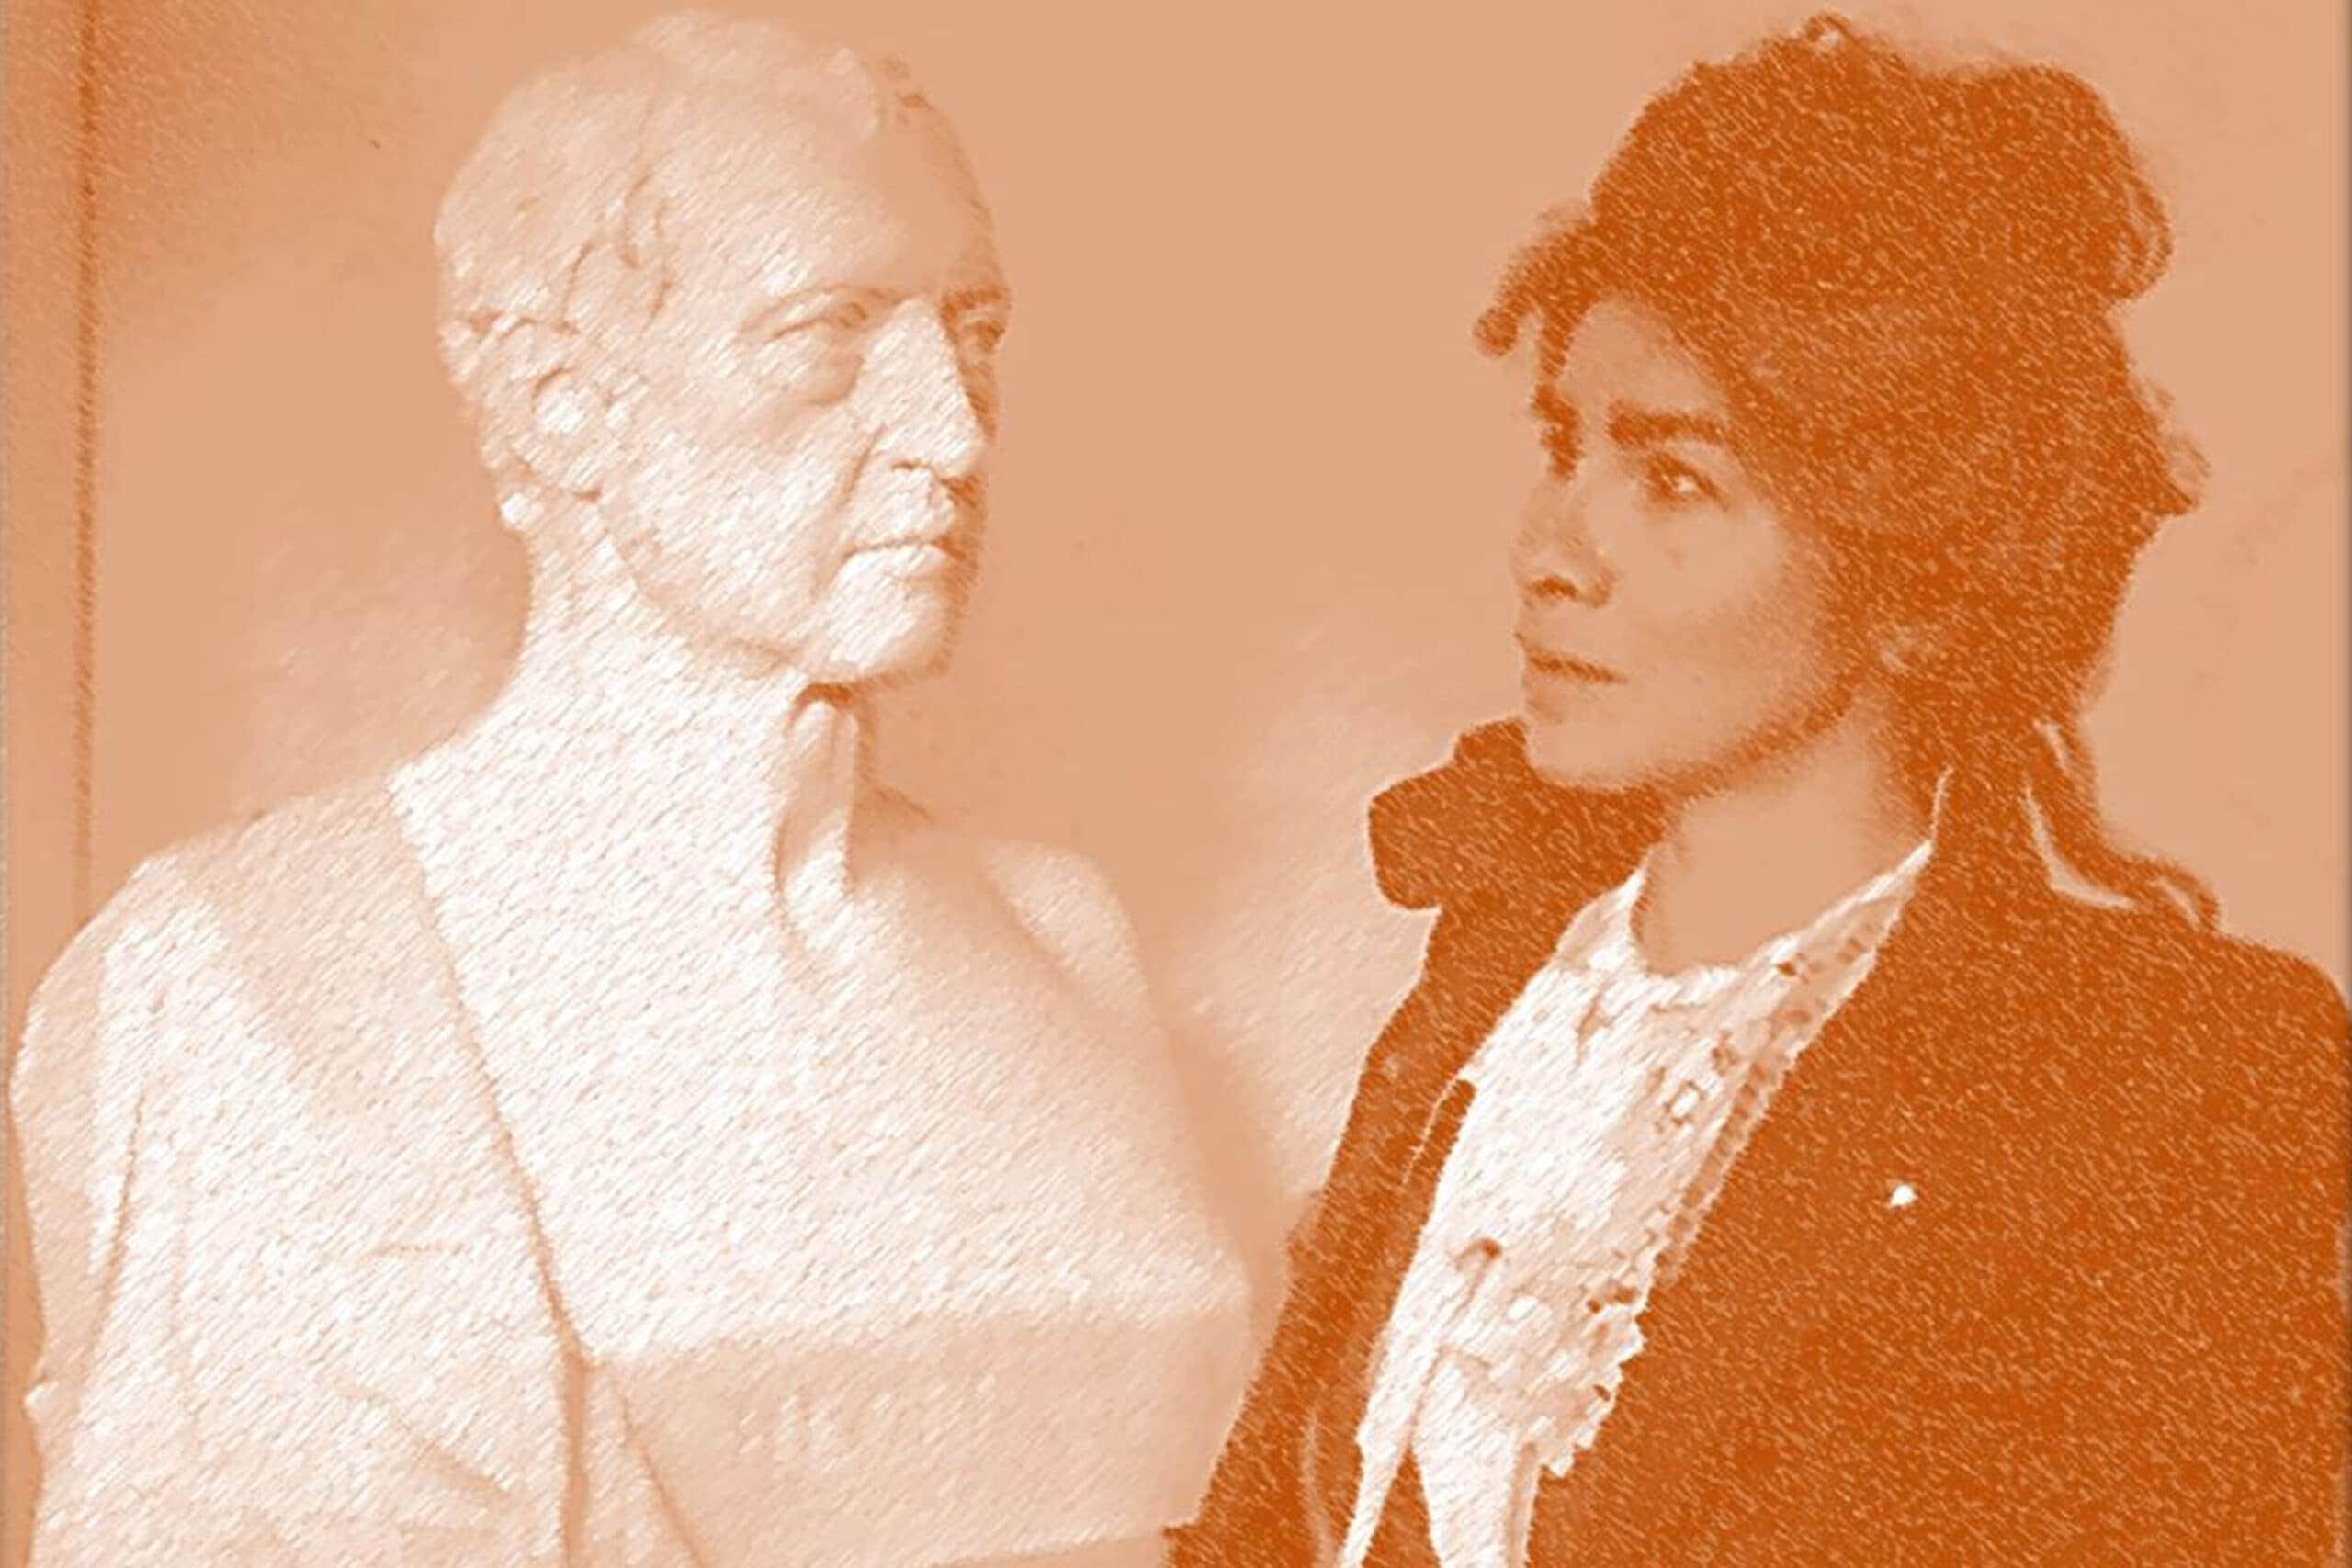 Stuttgart-Geschichten aus der Zeit des jungen Hegel